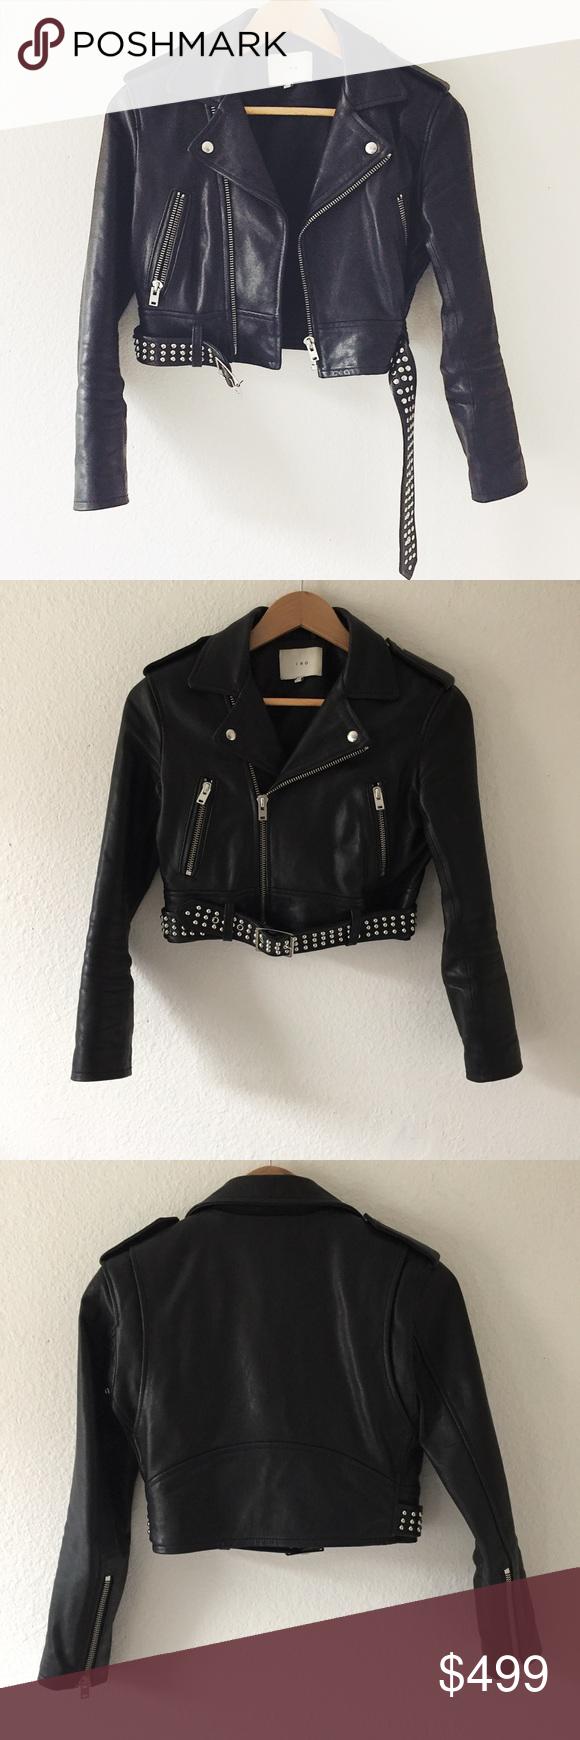 Iro Zekine Cropped Black Leather Jacket Celebrity Favorite The Iro Zekine Jacket Has Been Seen On Hailey Baldwin And Christina Aguilera Cropped Close Fit With [ 1740 x 580 Pixel ]